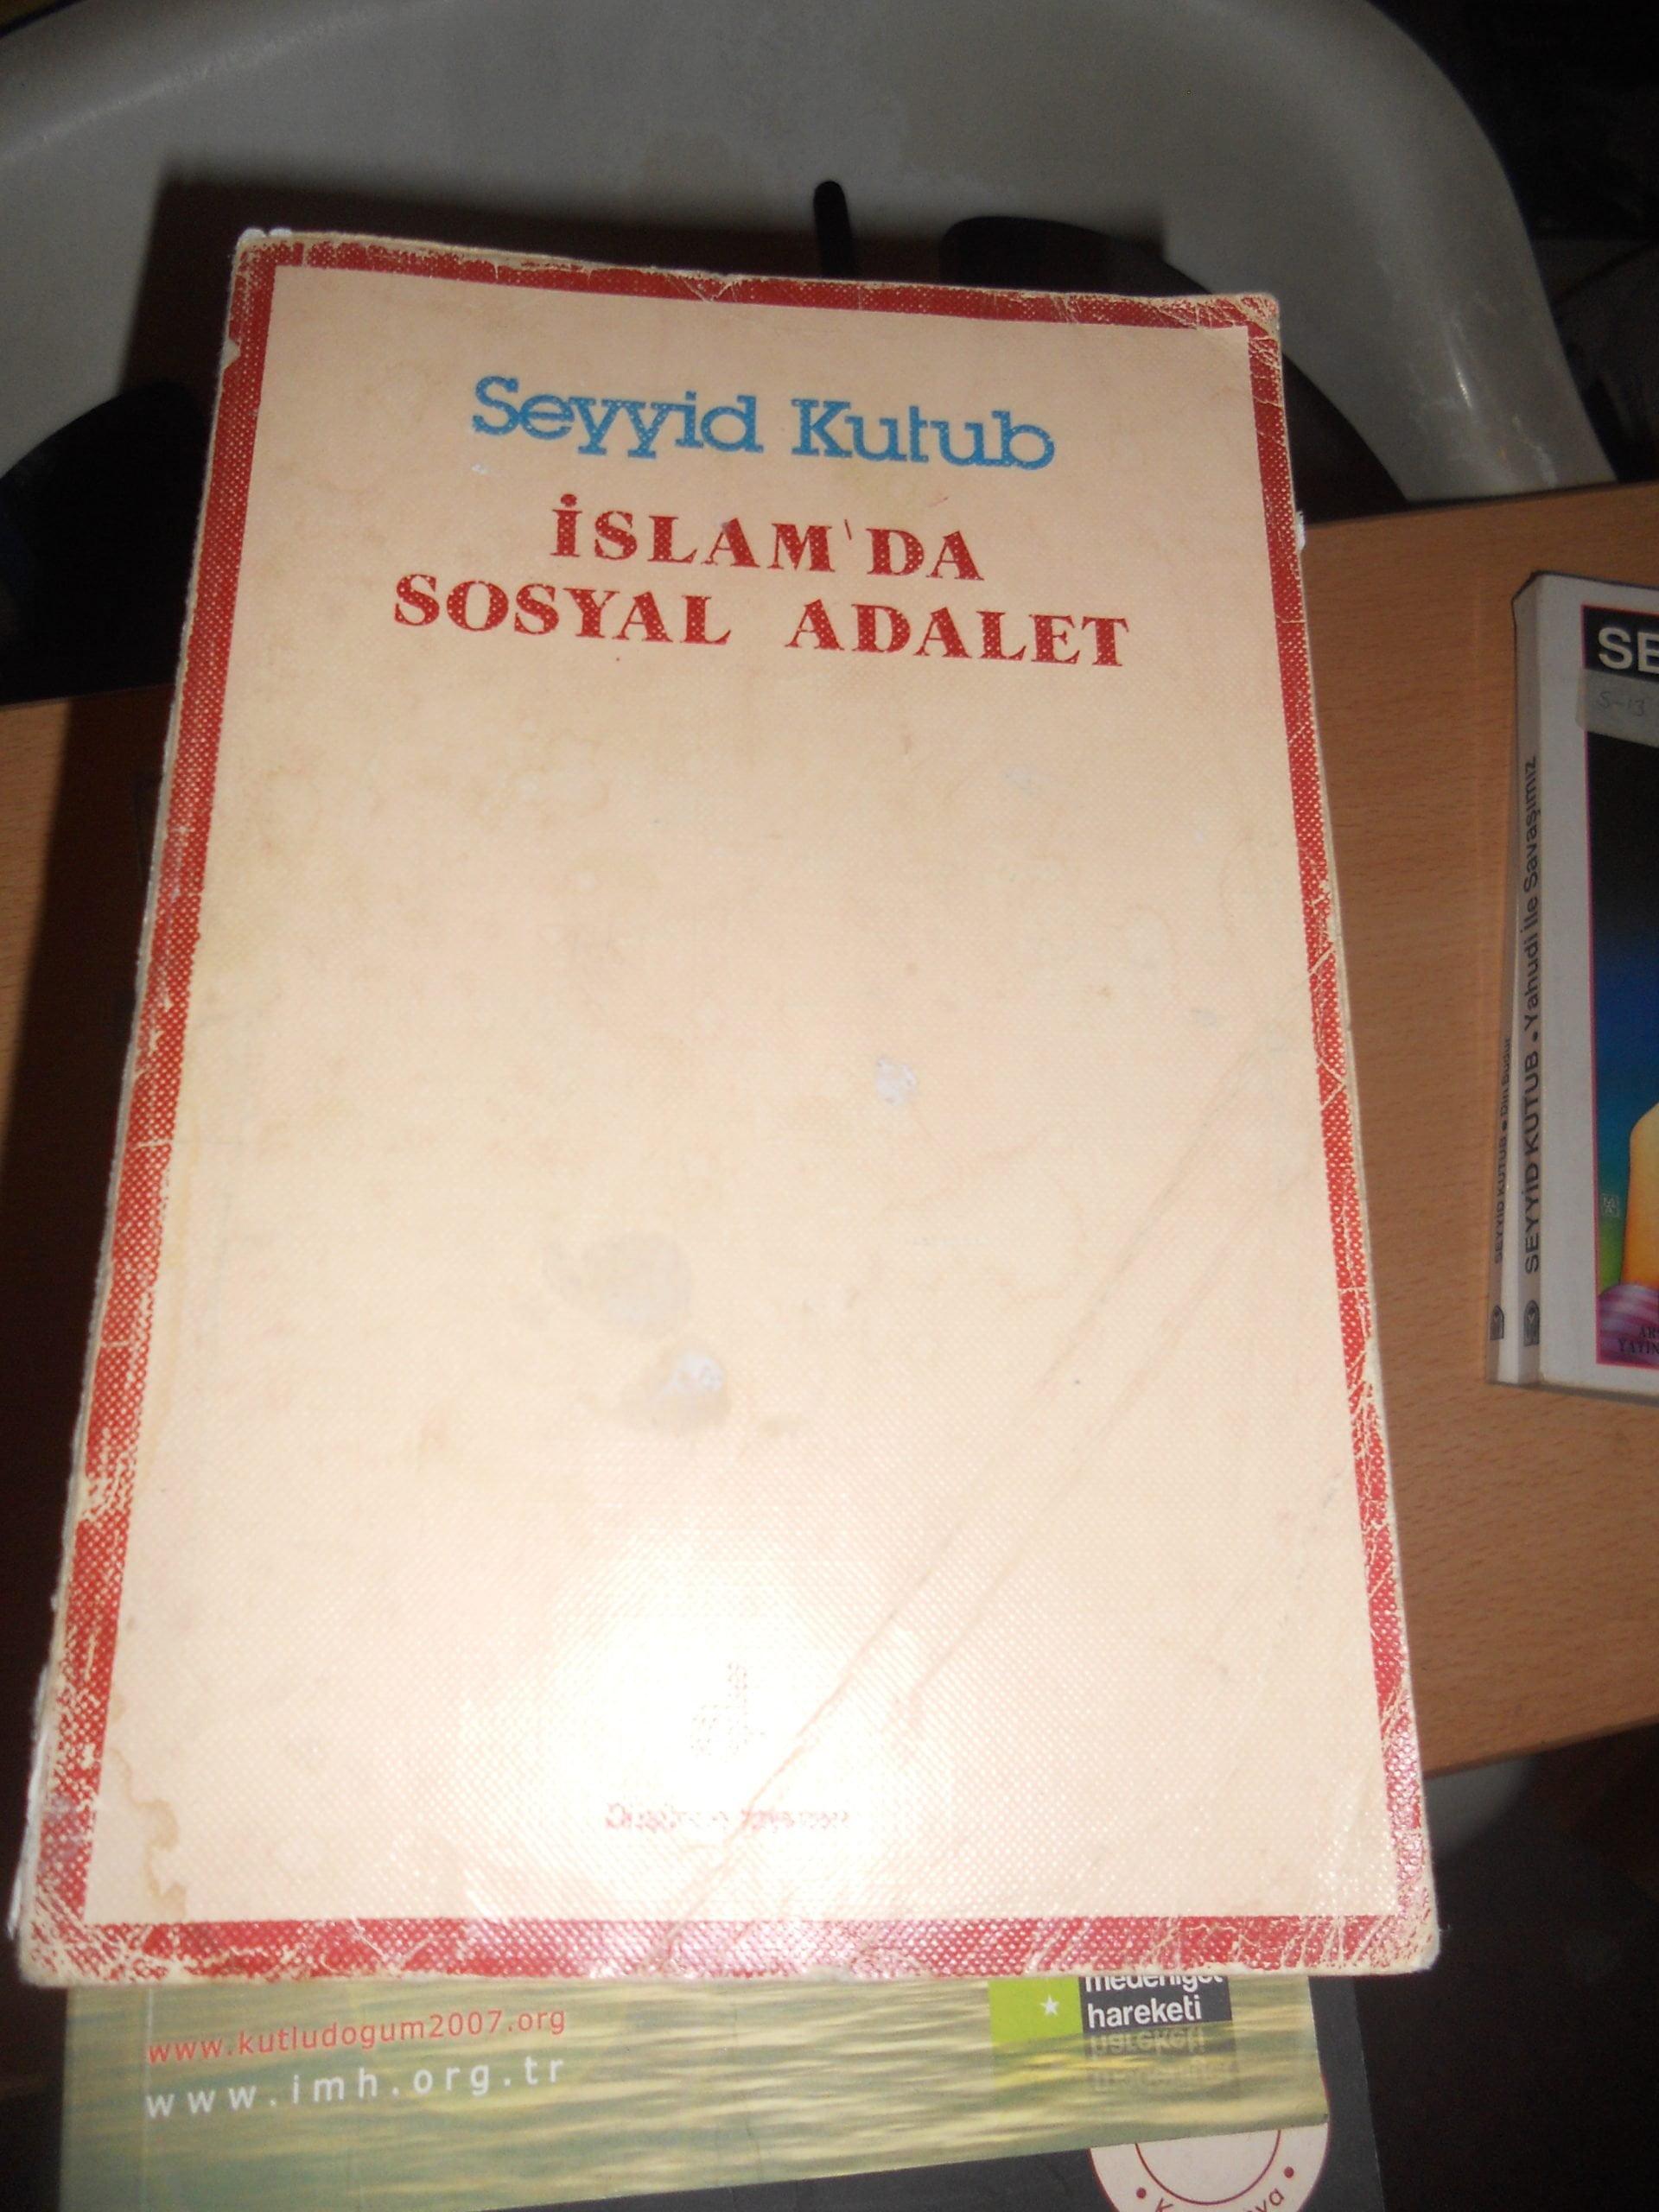 İSLAMDA SOSYAL ADALET/Seyyid KUTUP/ 15 TL